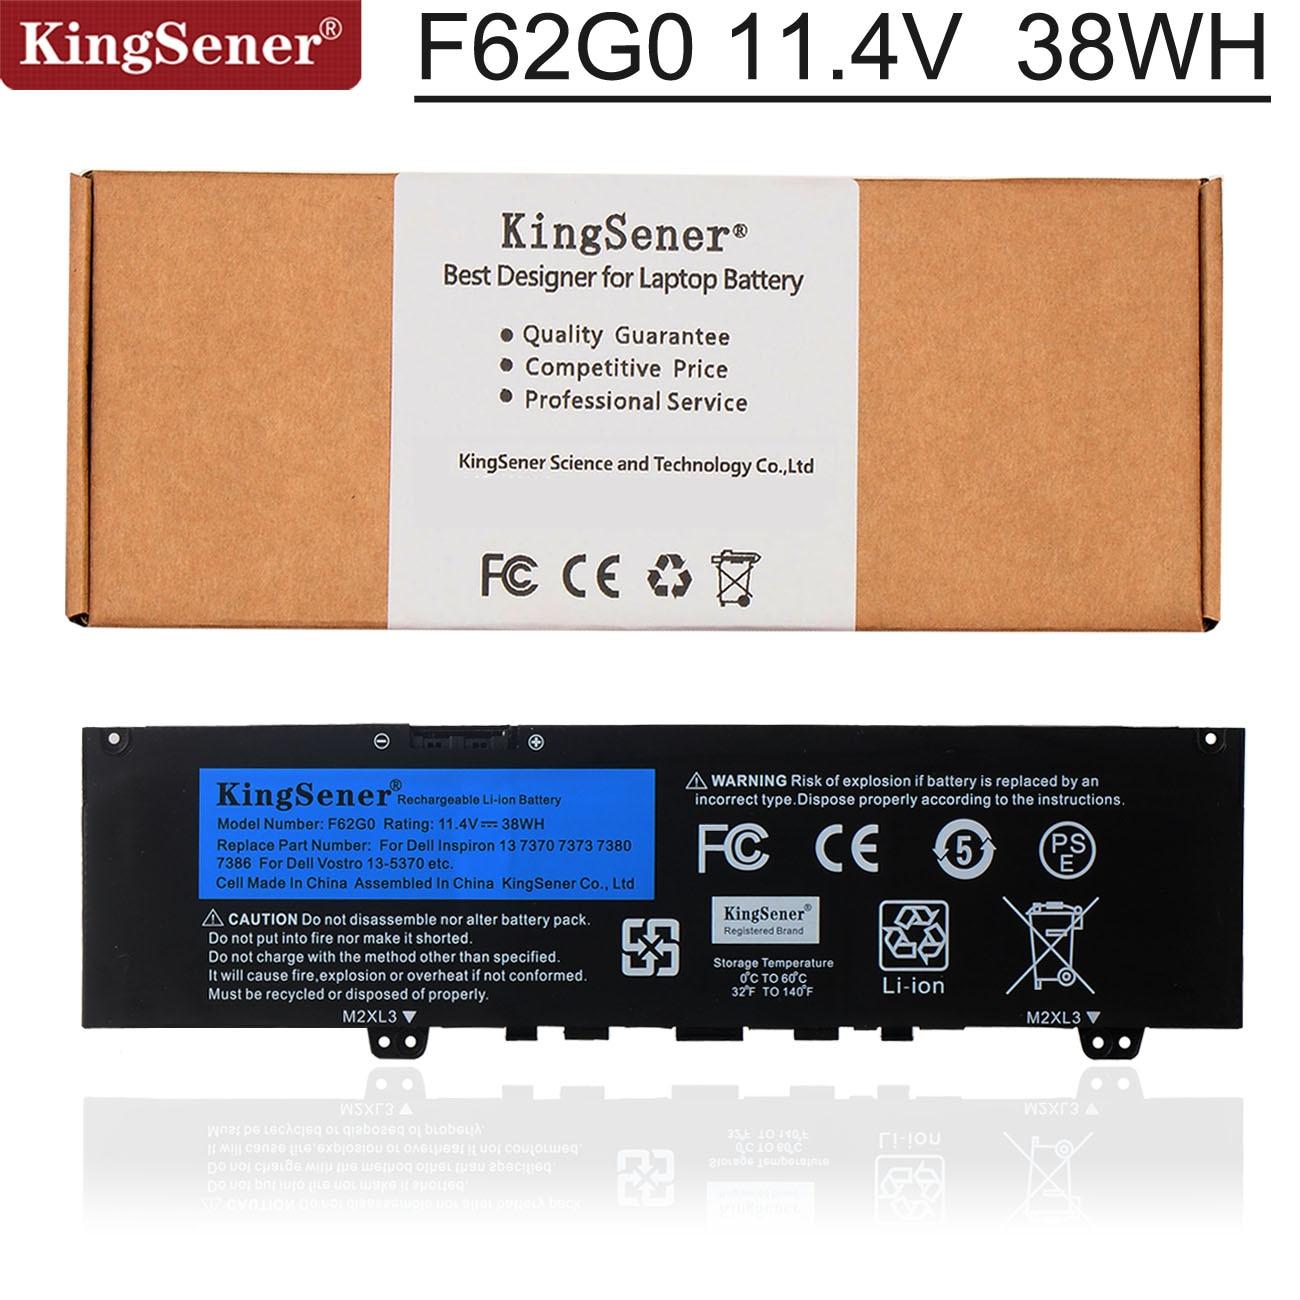 Kingsener F62G0 بطارية كمبيوتر محمول لديل انسبايرون 13 7370 7373 7380 7386 Vostro 5370 P83G P87G P91GRPJC3 39DY5 11.4V 38WH